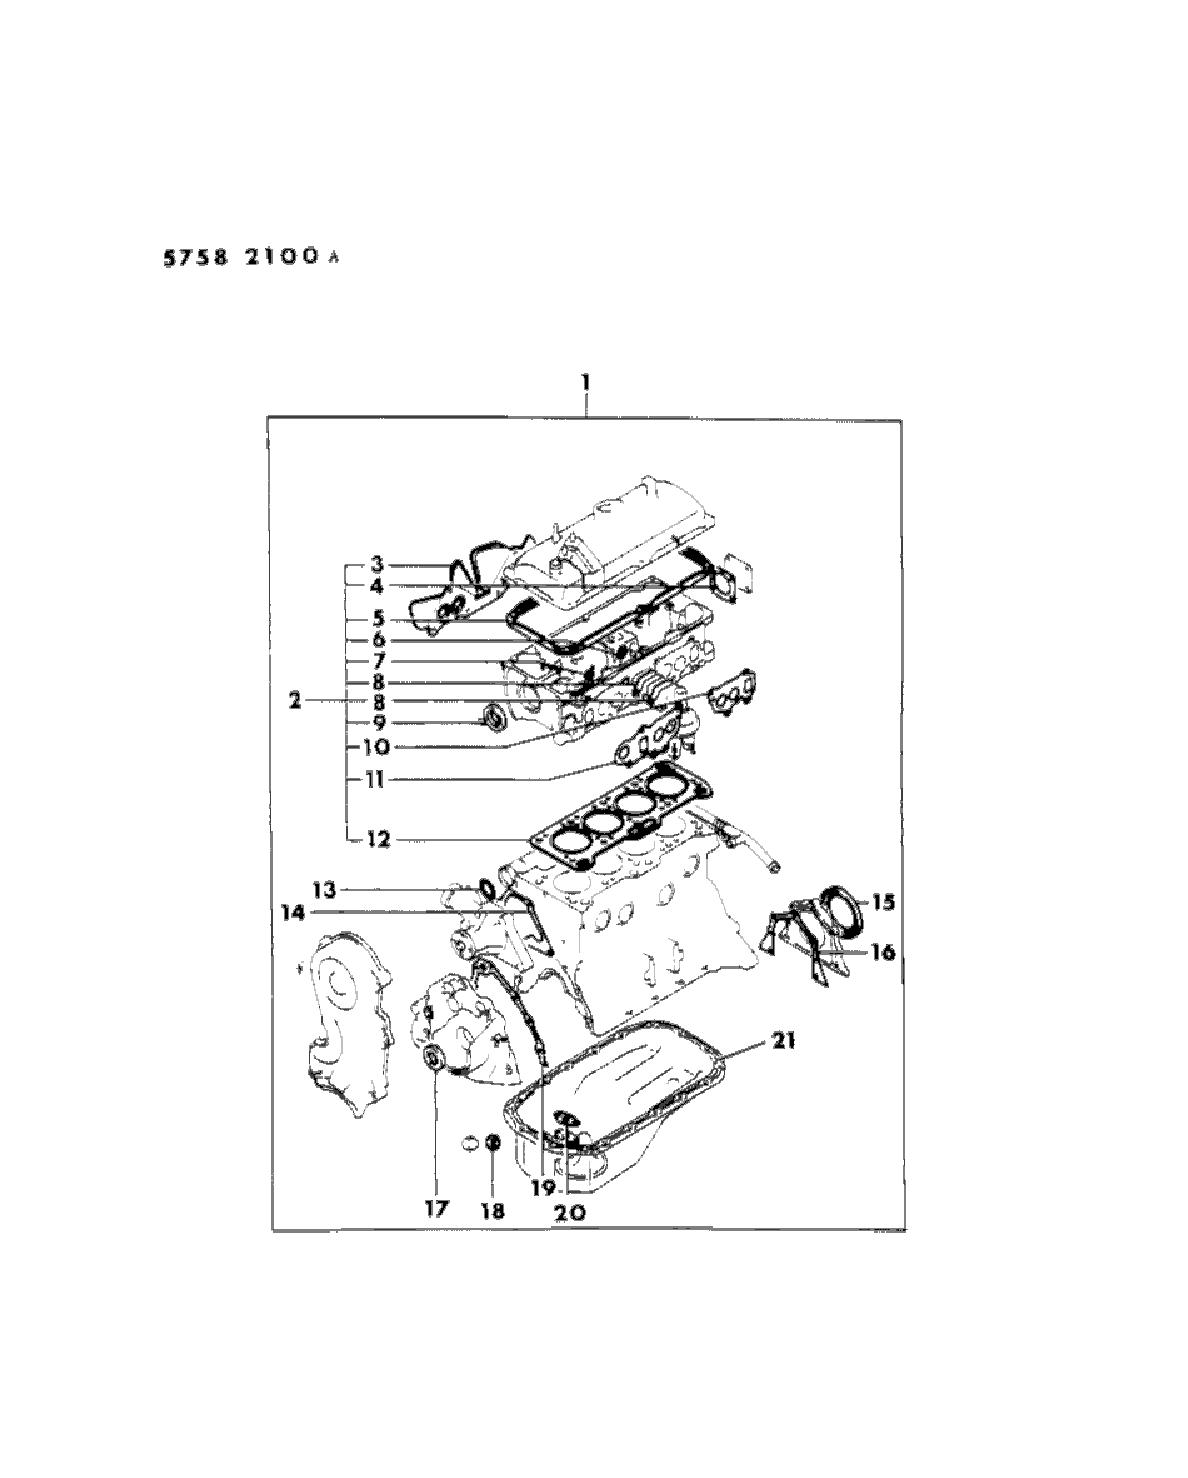 1985 dodge ram 50 engine gasket sets - thumbnail 1